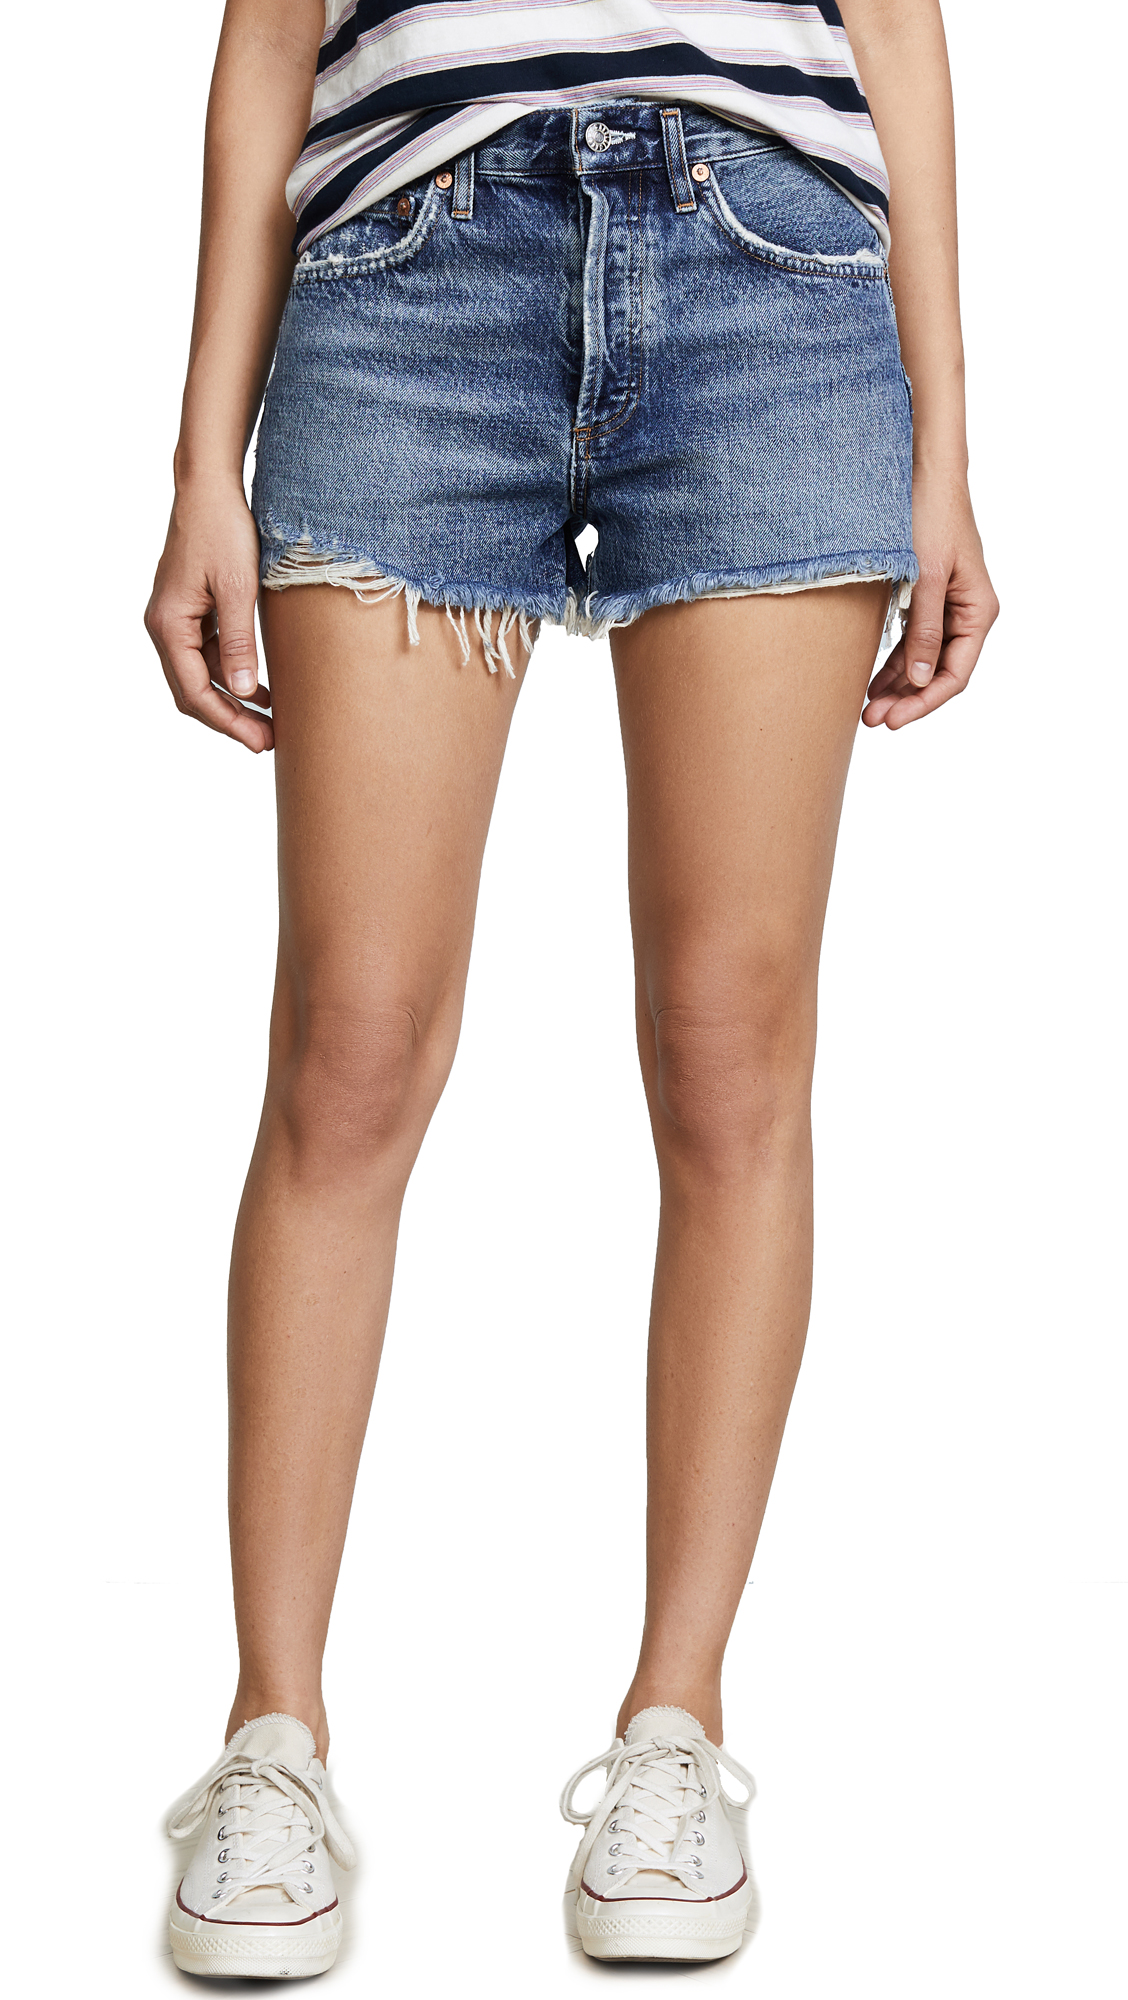 AGOLDE Parker Vintage Loose Fit Cutoff Shorts - Rock Steady